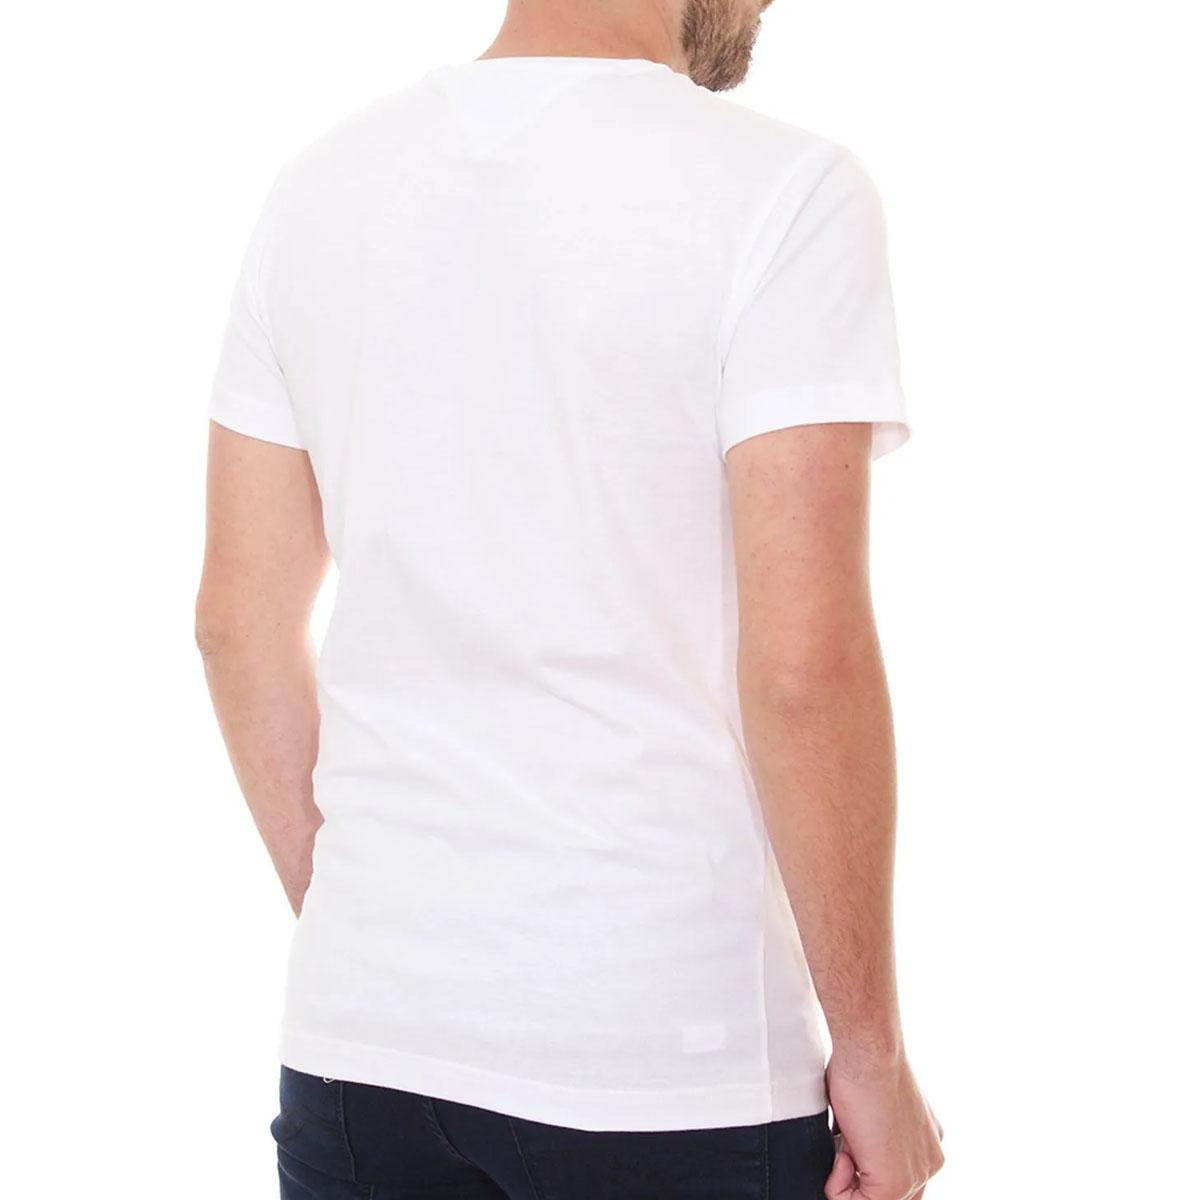 Camiseta Tommy Hilfiger Small Chest Box Branco